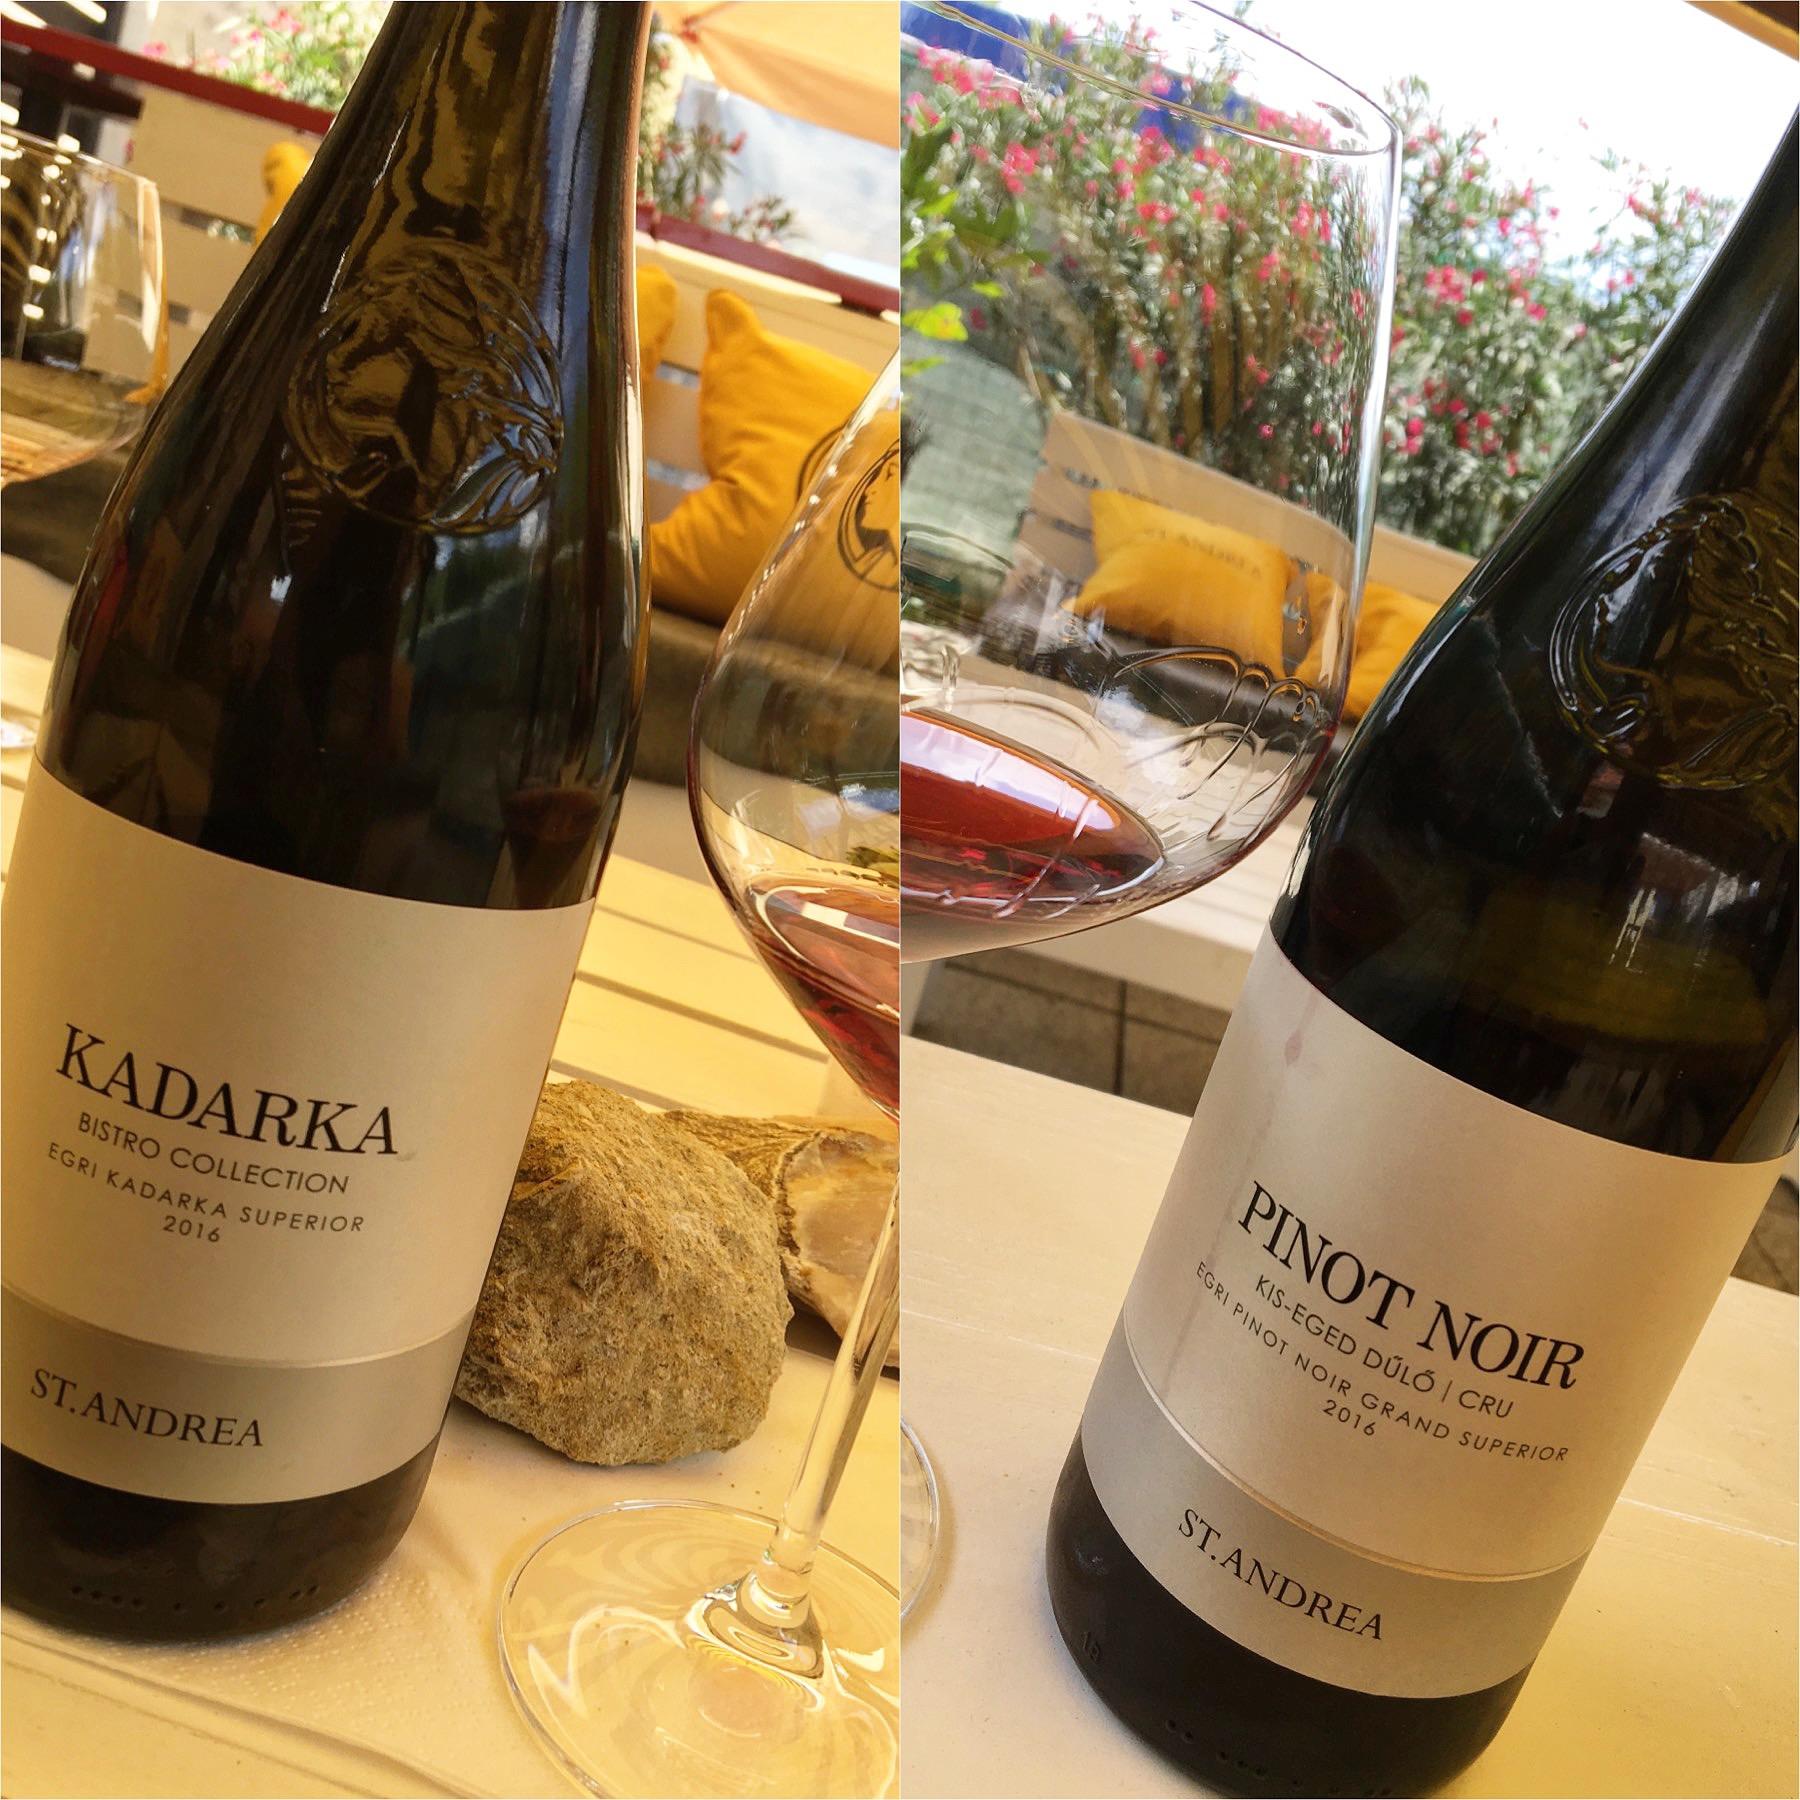 St. Andrea Kadarka & Pinot Noir